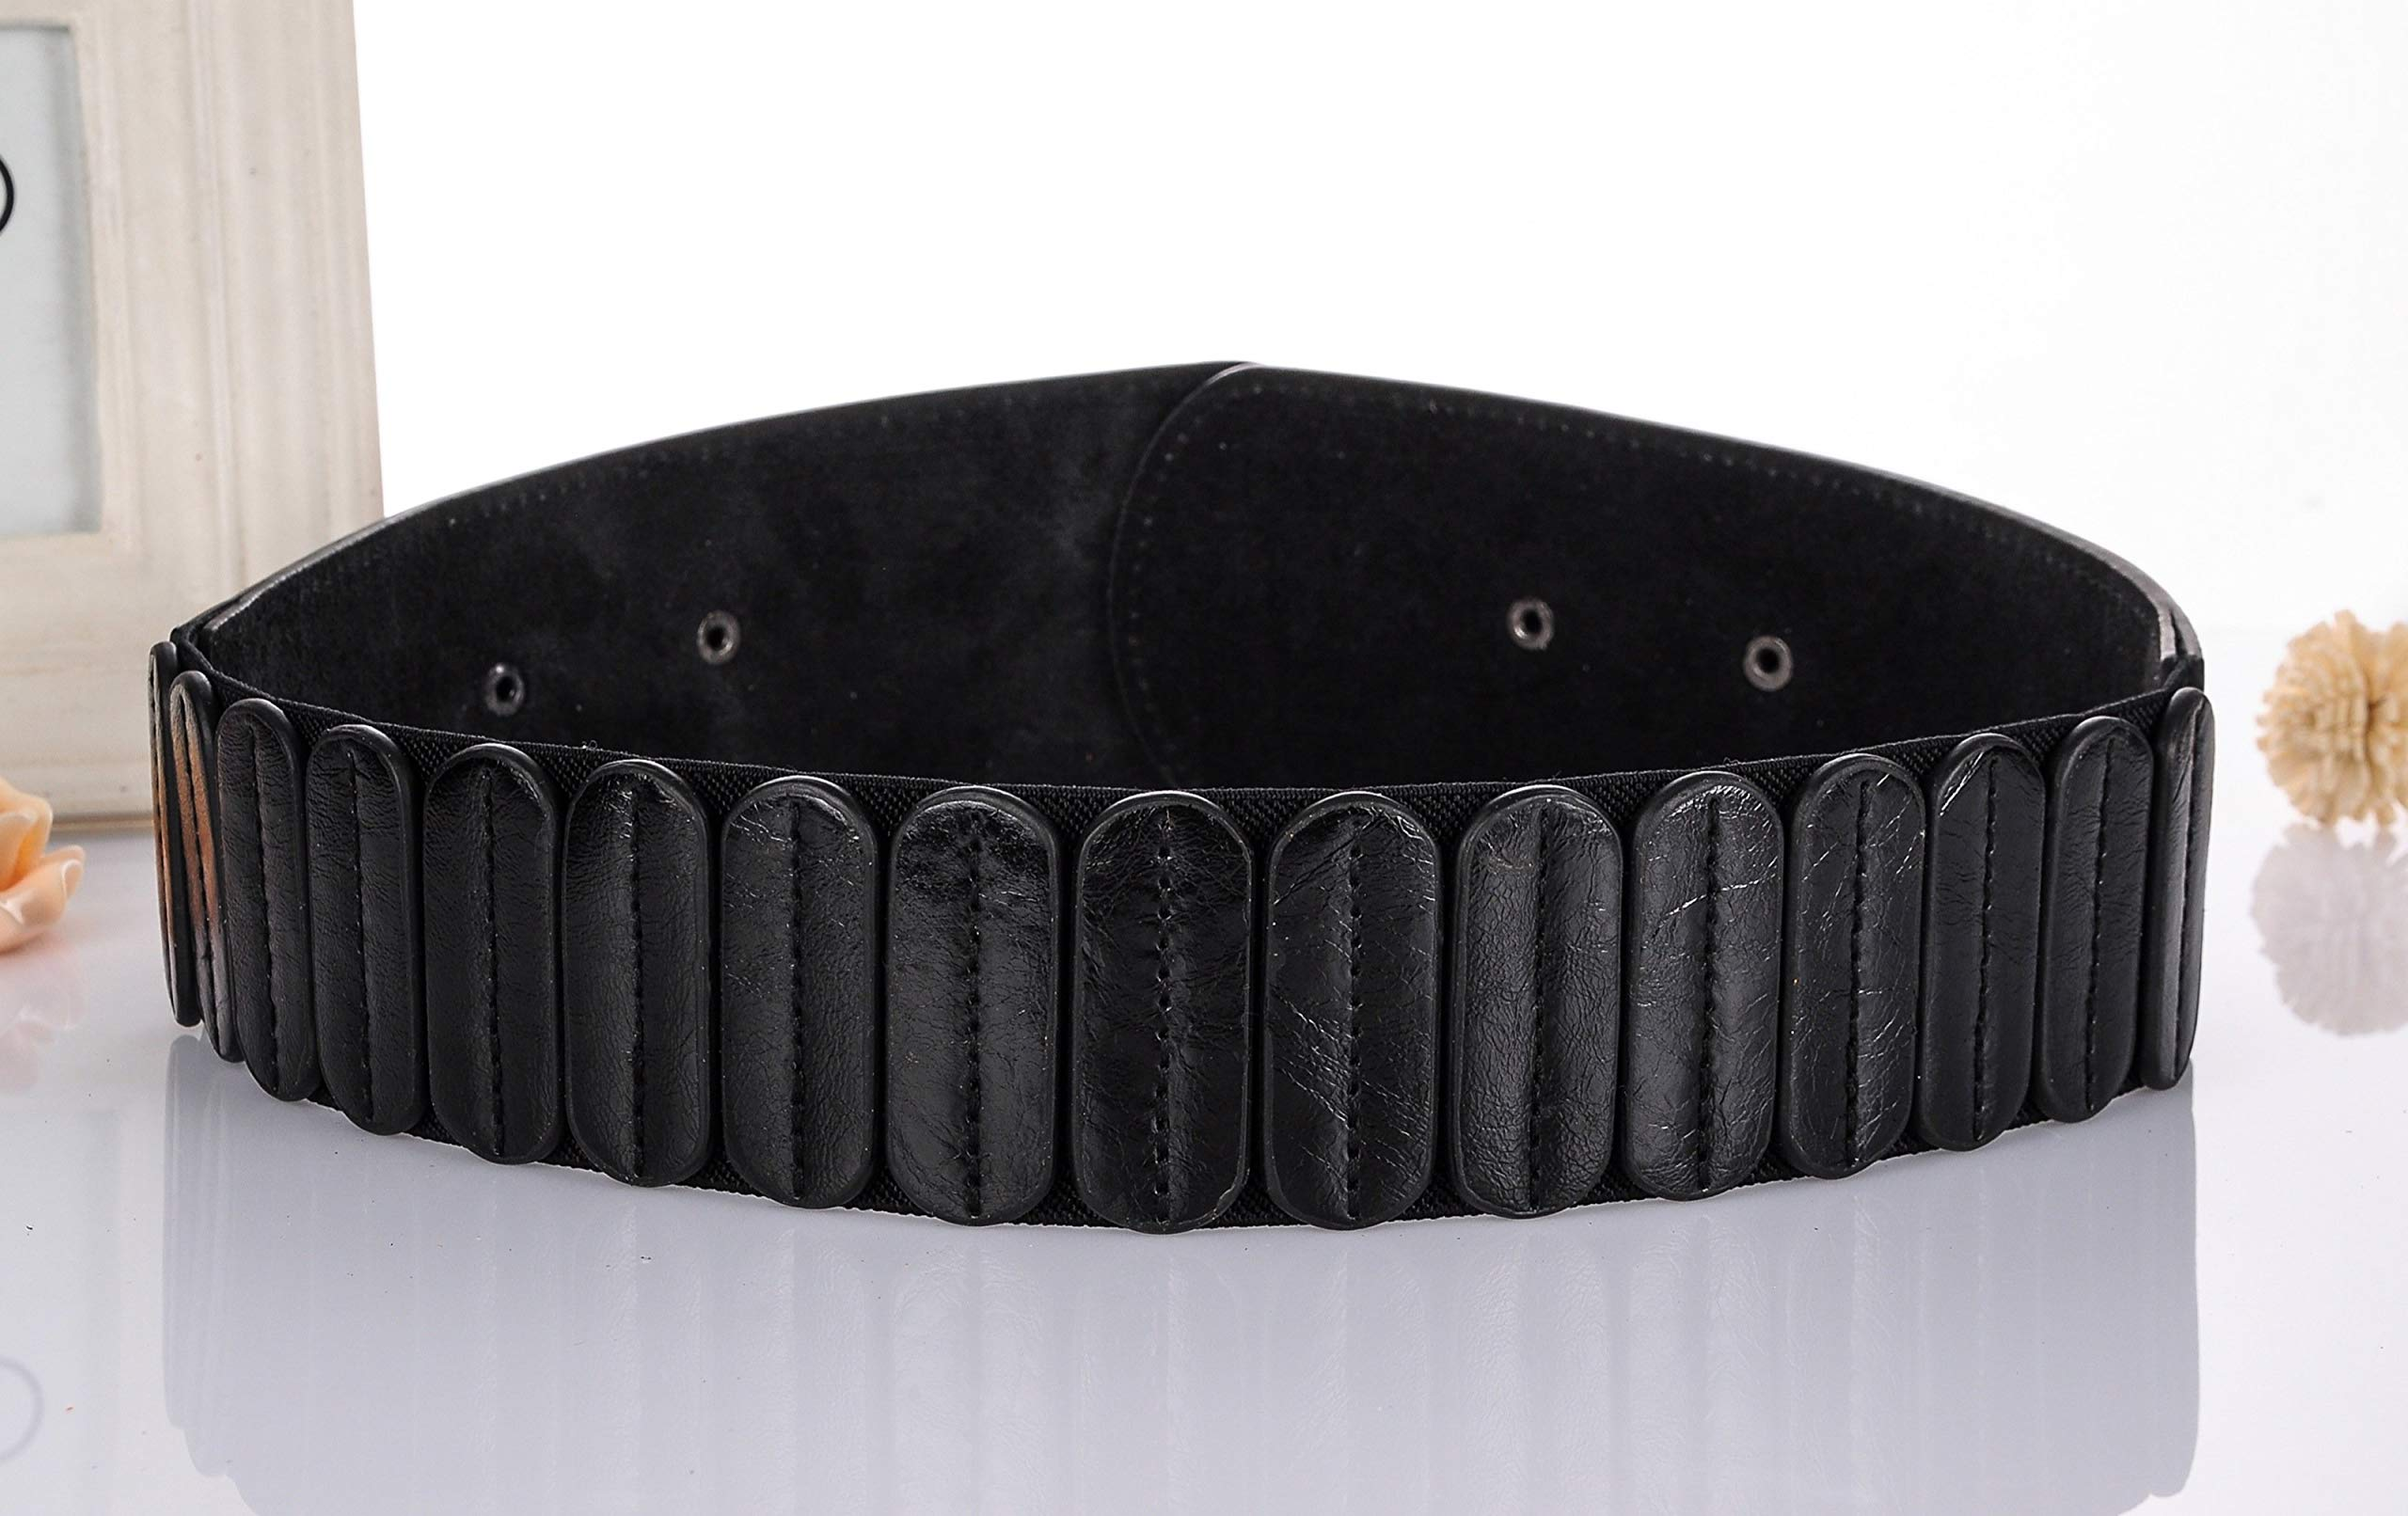 Ayli Womens Waist Belt, Metal Horseshoe Hook Leather Wide Elastic Stretch Cinch Belt, Black, Fits Waist 29'' to 35'' (US Pant/Dress Size 6-14), bt6b510bk by As You Like It (Image #2)